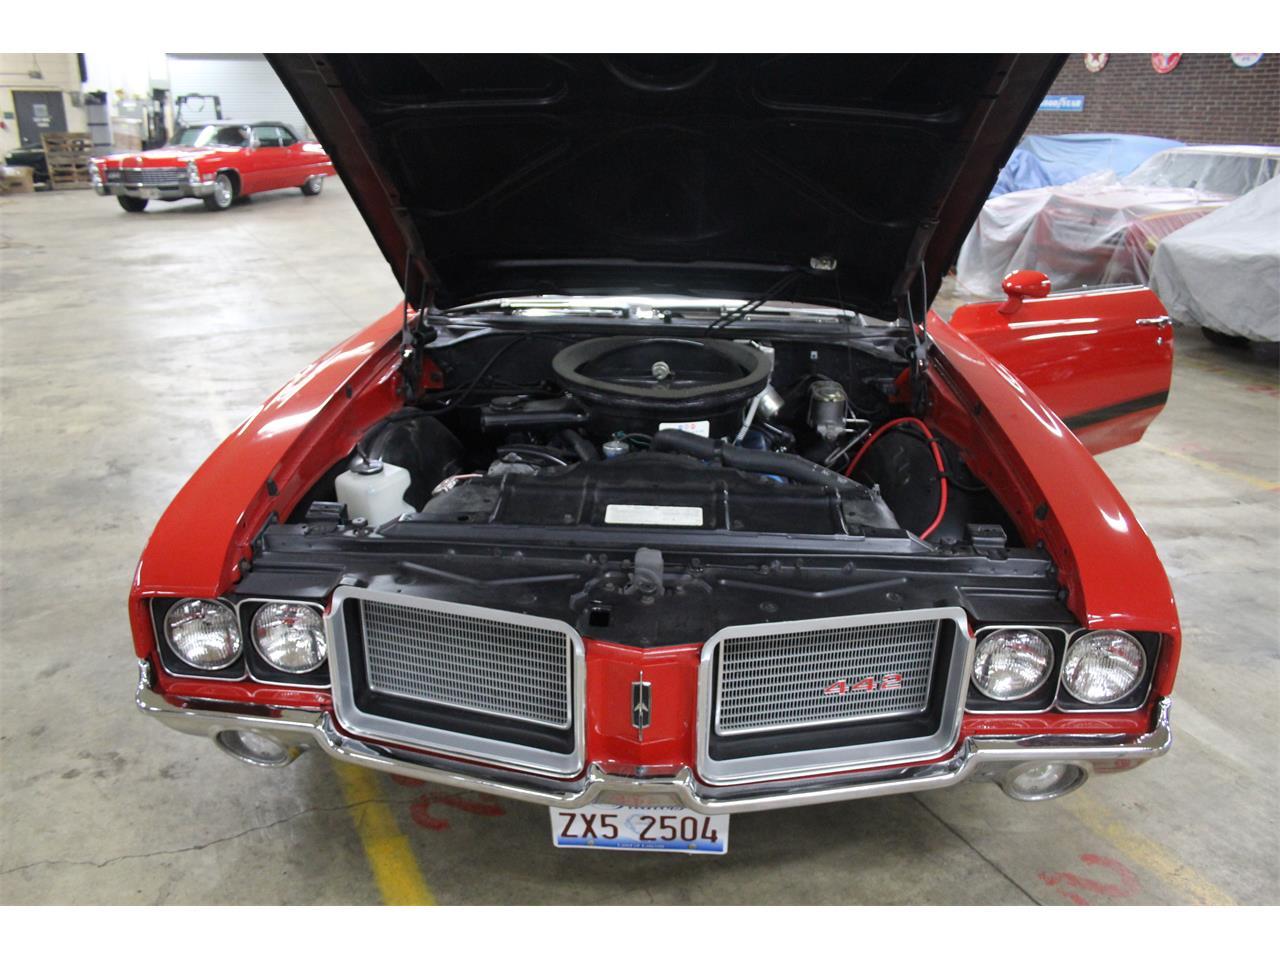 1972 Oldsmobile Cutlass (CC-1046230) for sale in LAKE ZURICH, Illinois